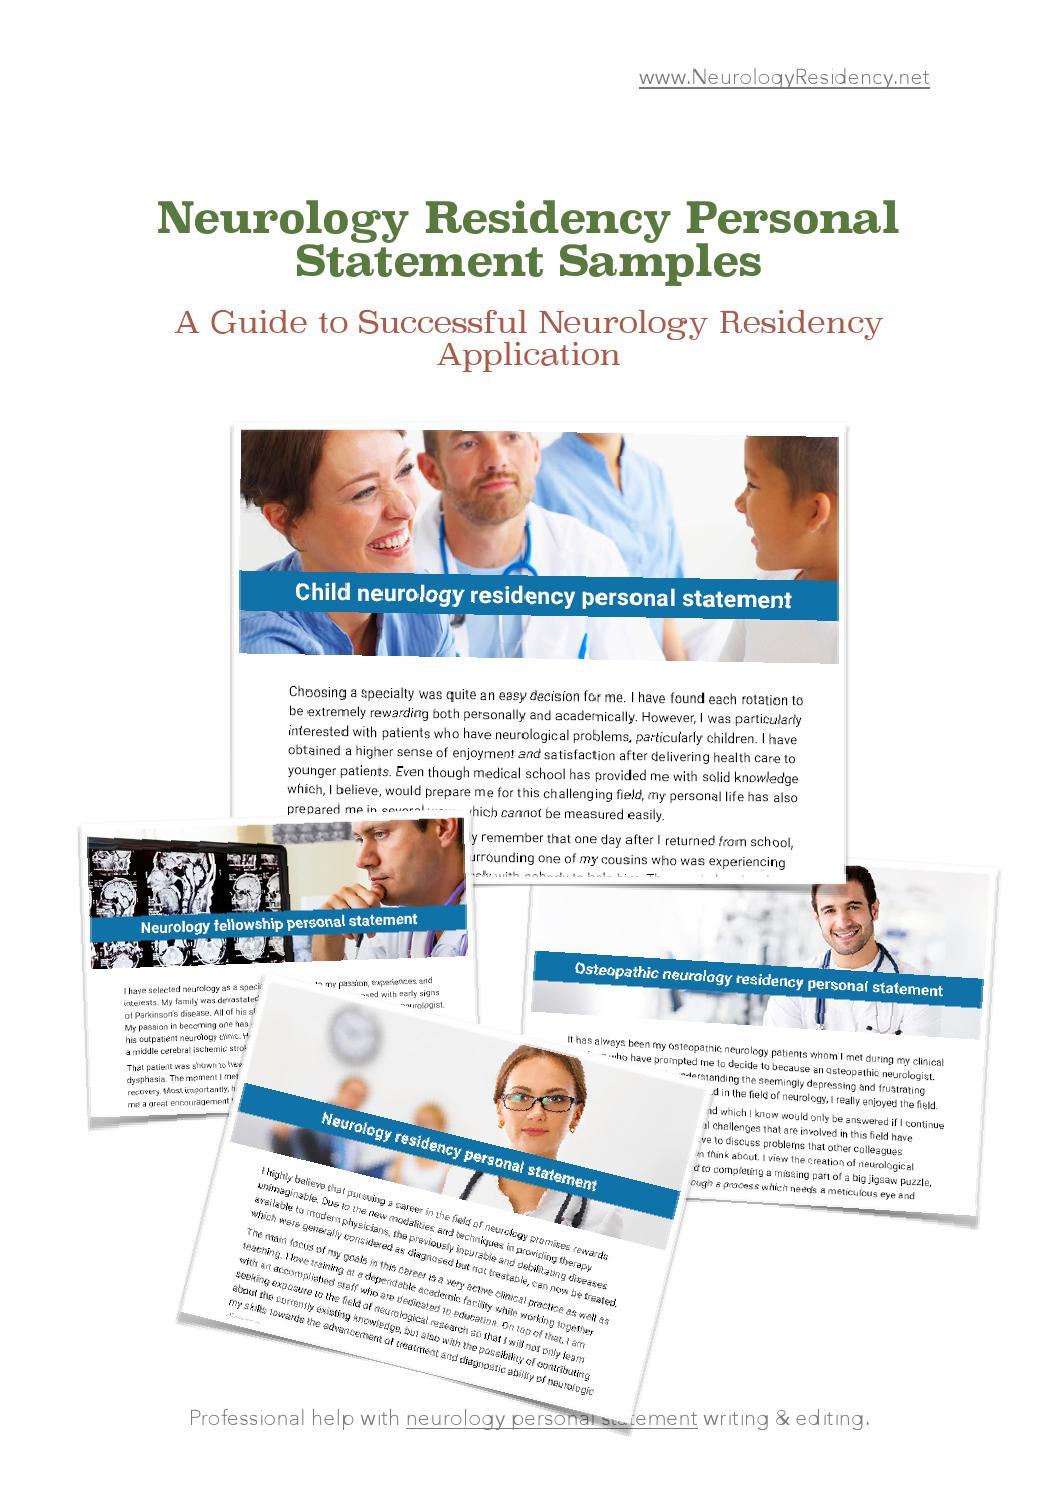 Neurology residency personal statement samples by Nikki rajak - issuu